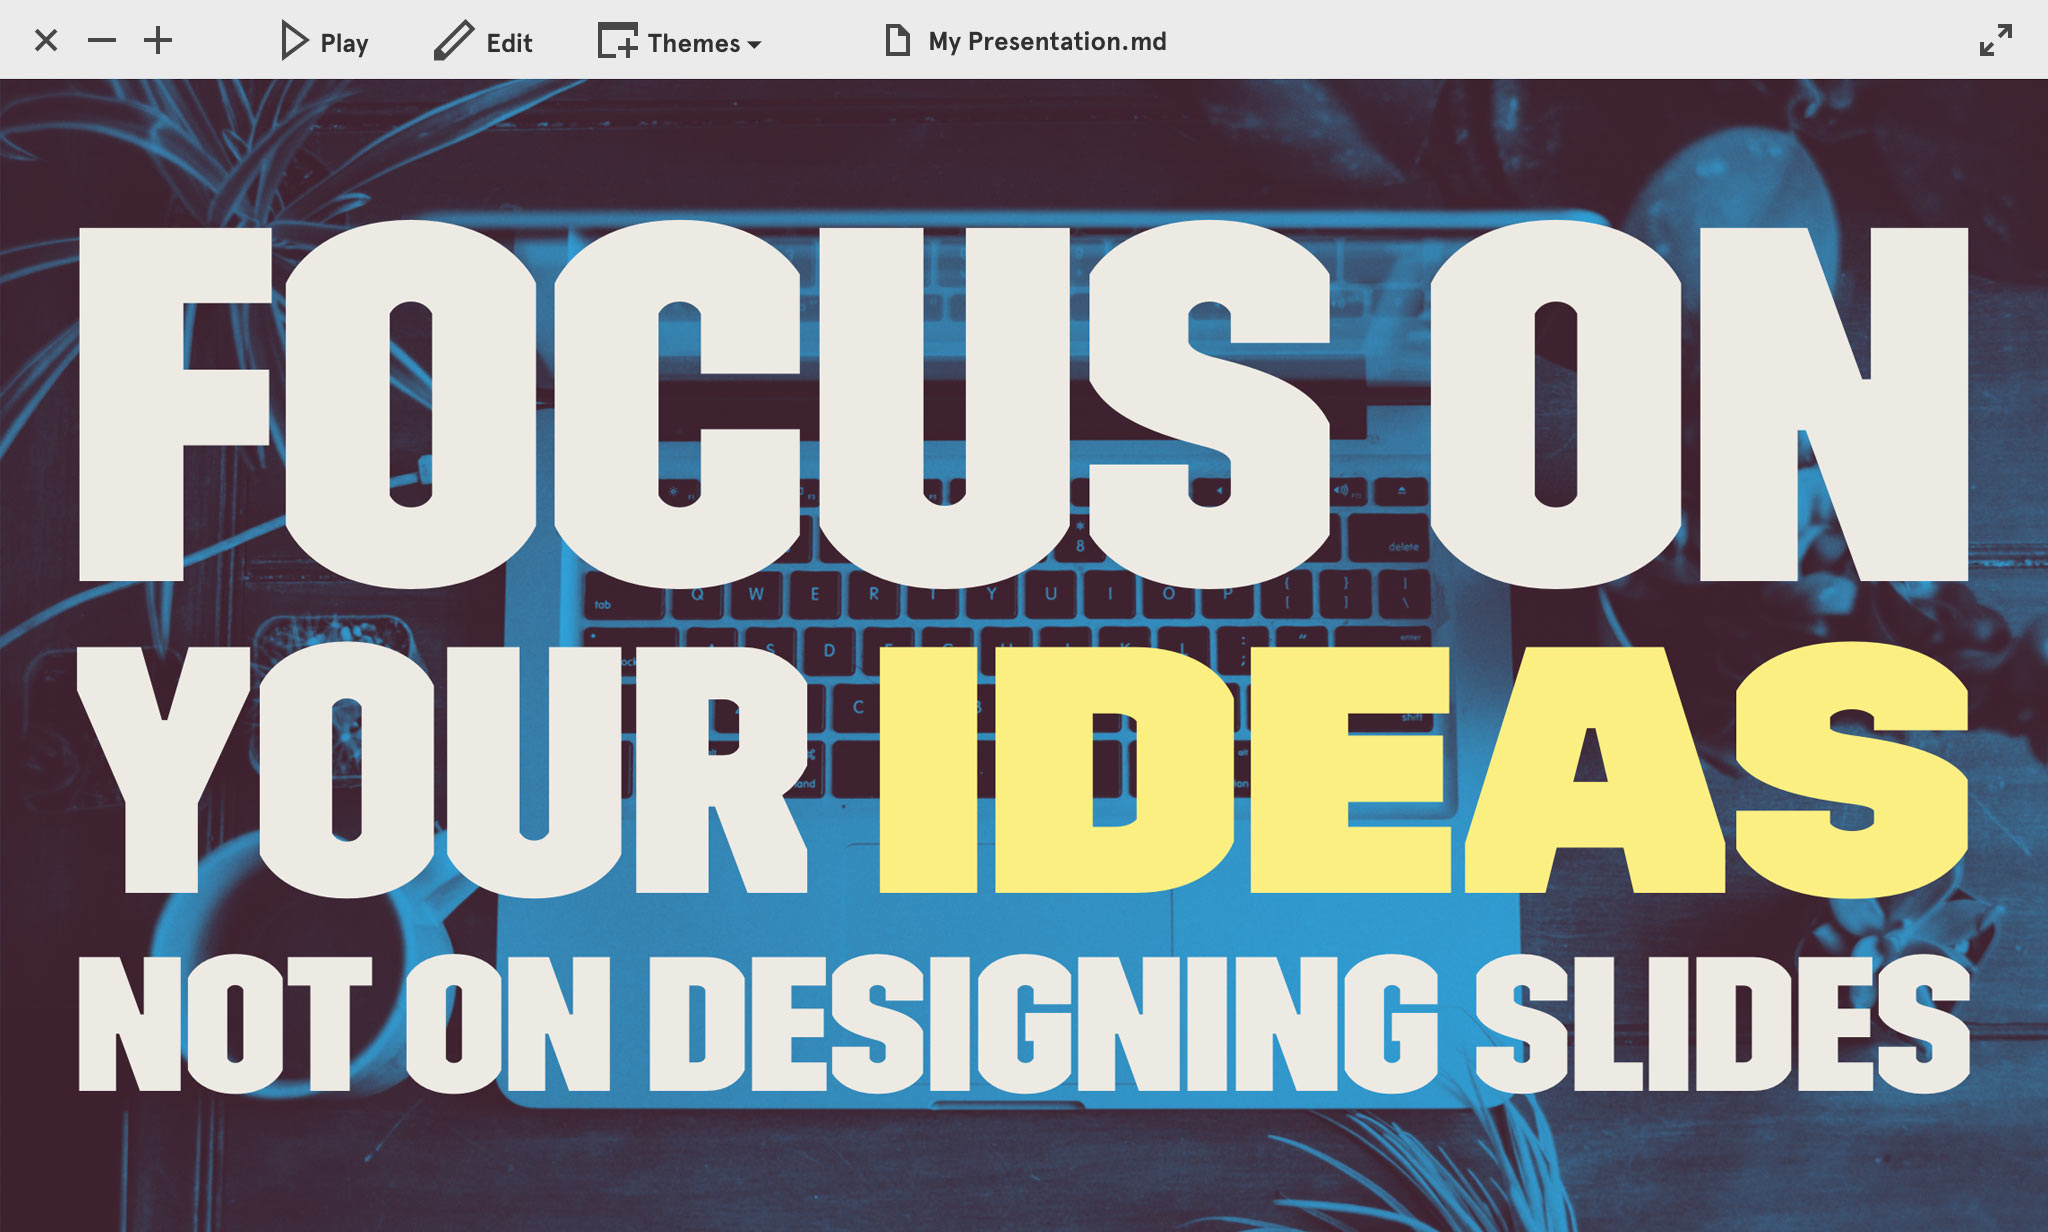 Focus on your Ideas, not on Desiging Slides